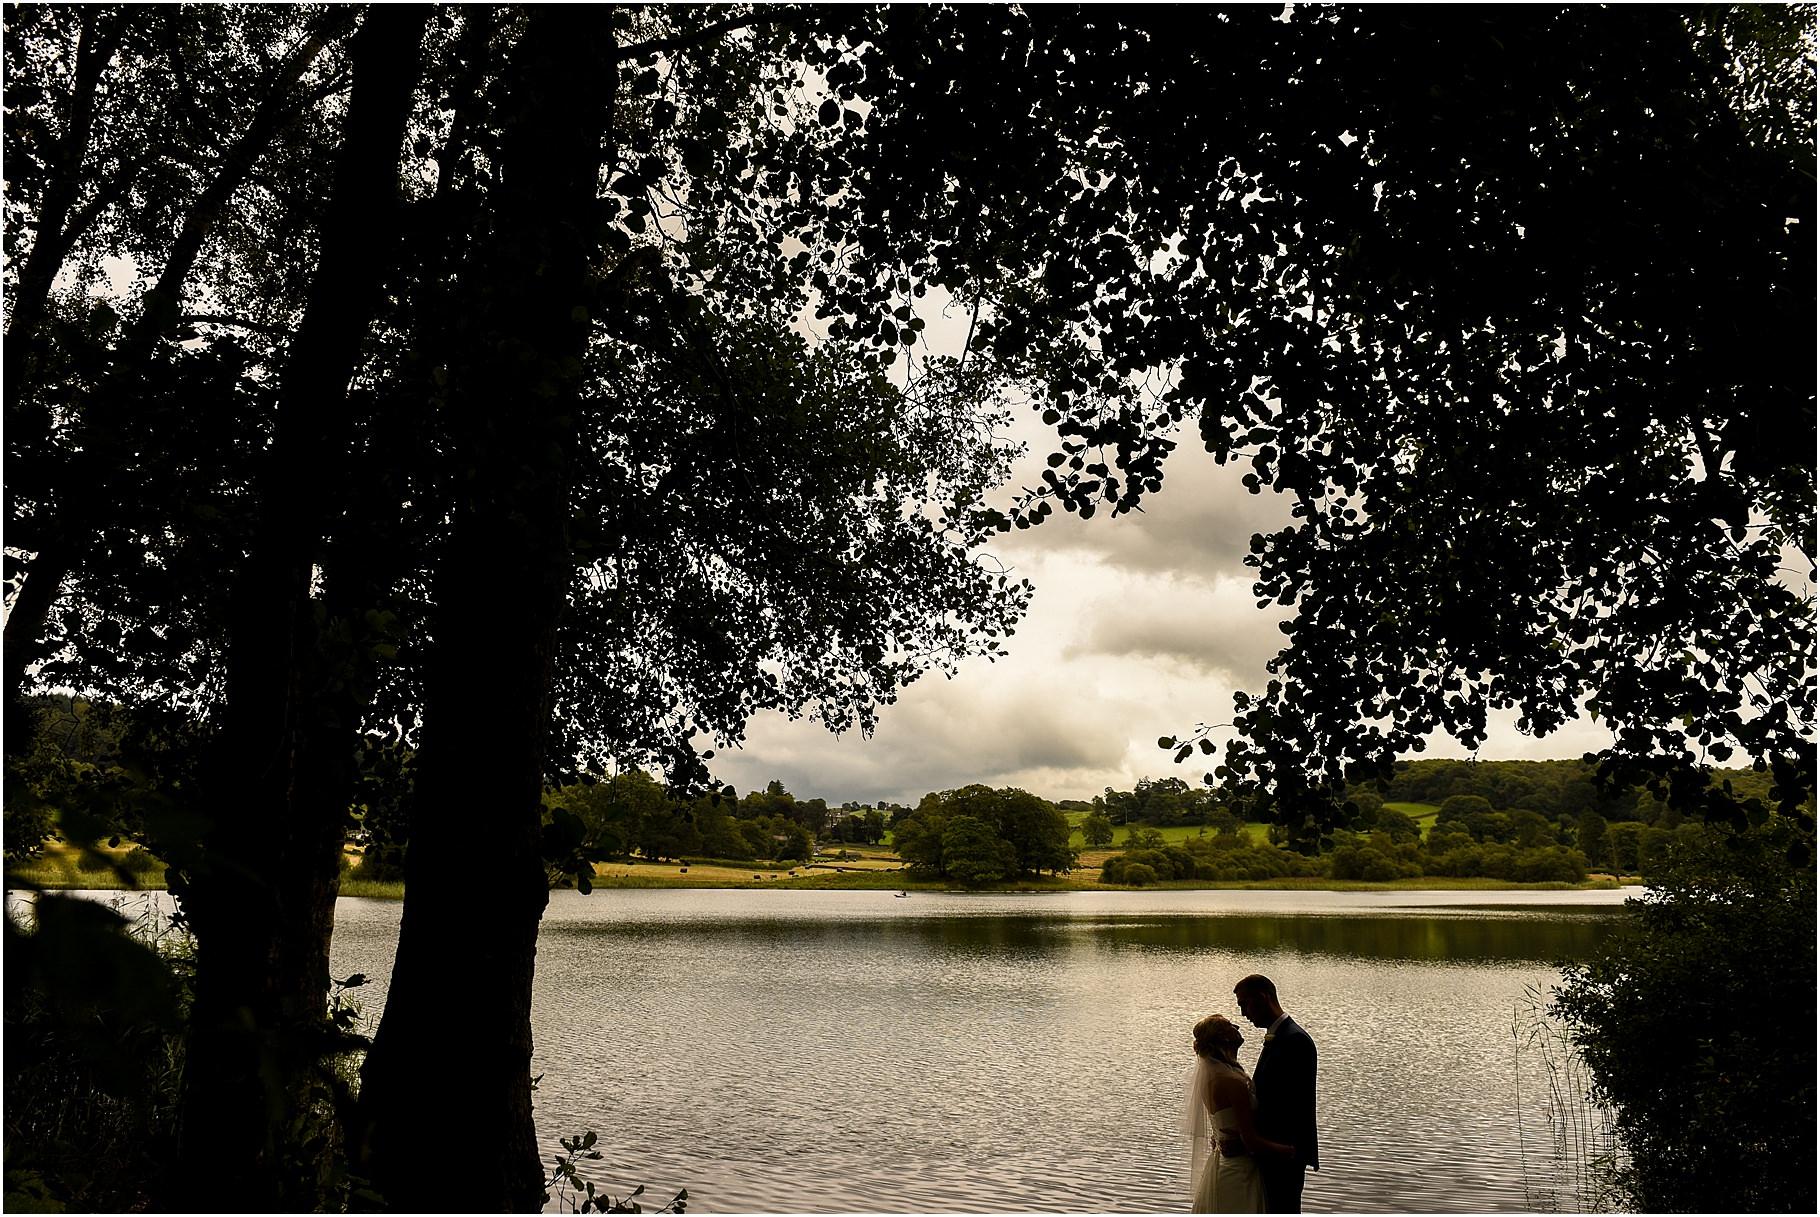 dan-wootton-photography-2017-weddings-046.jpg